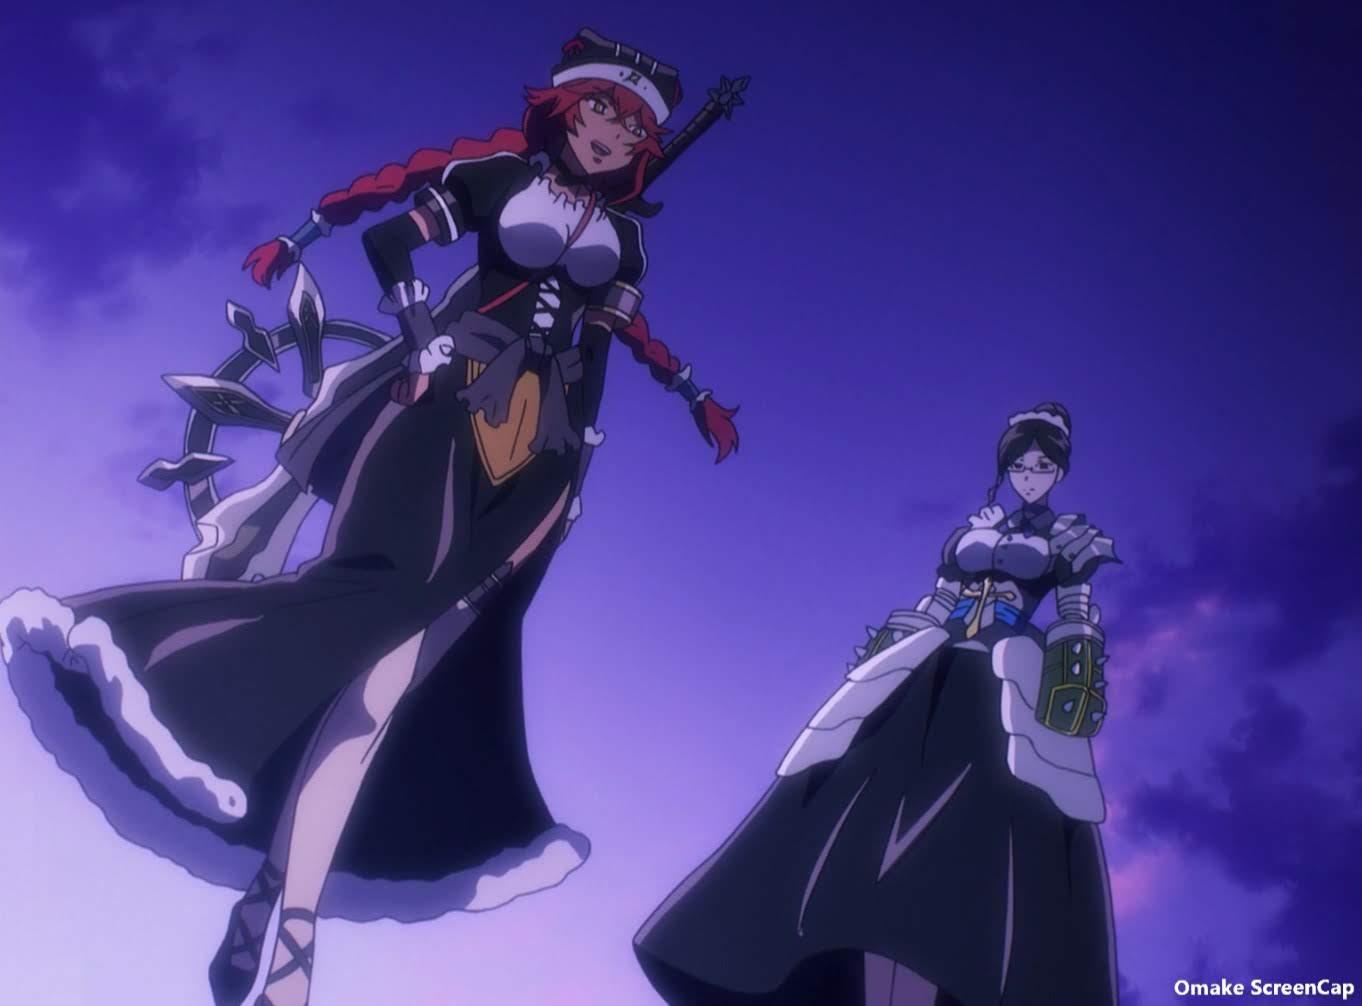 Joeschmo's Gears and Grounds: Omake Gif Anime - Overlord III